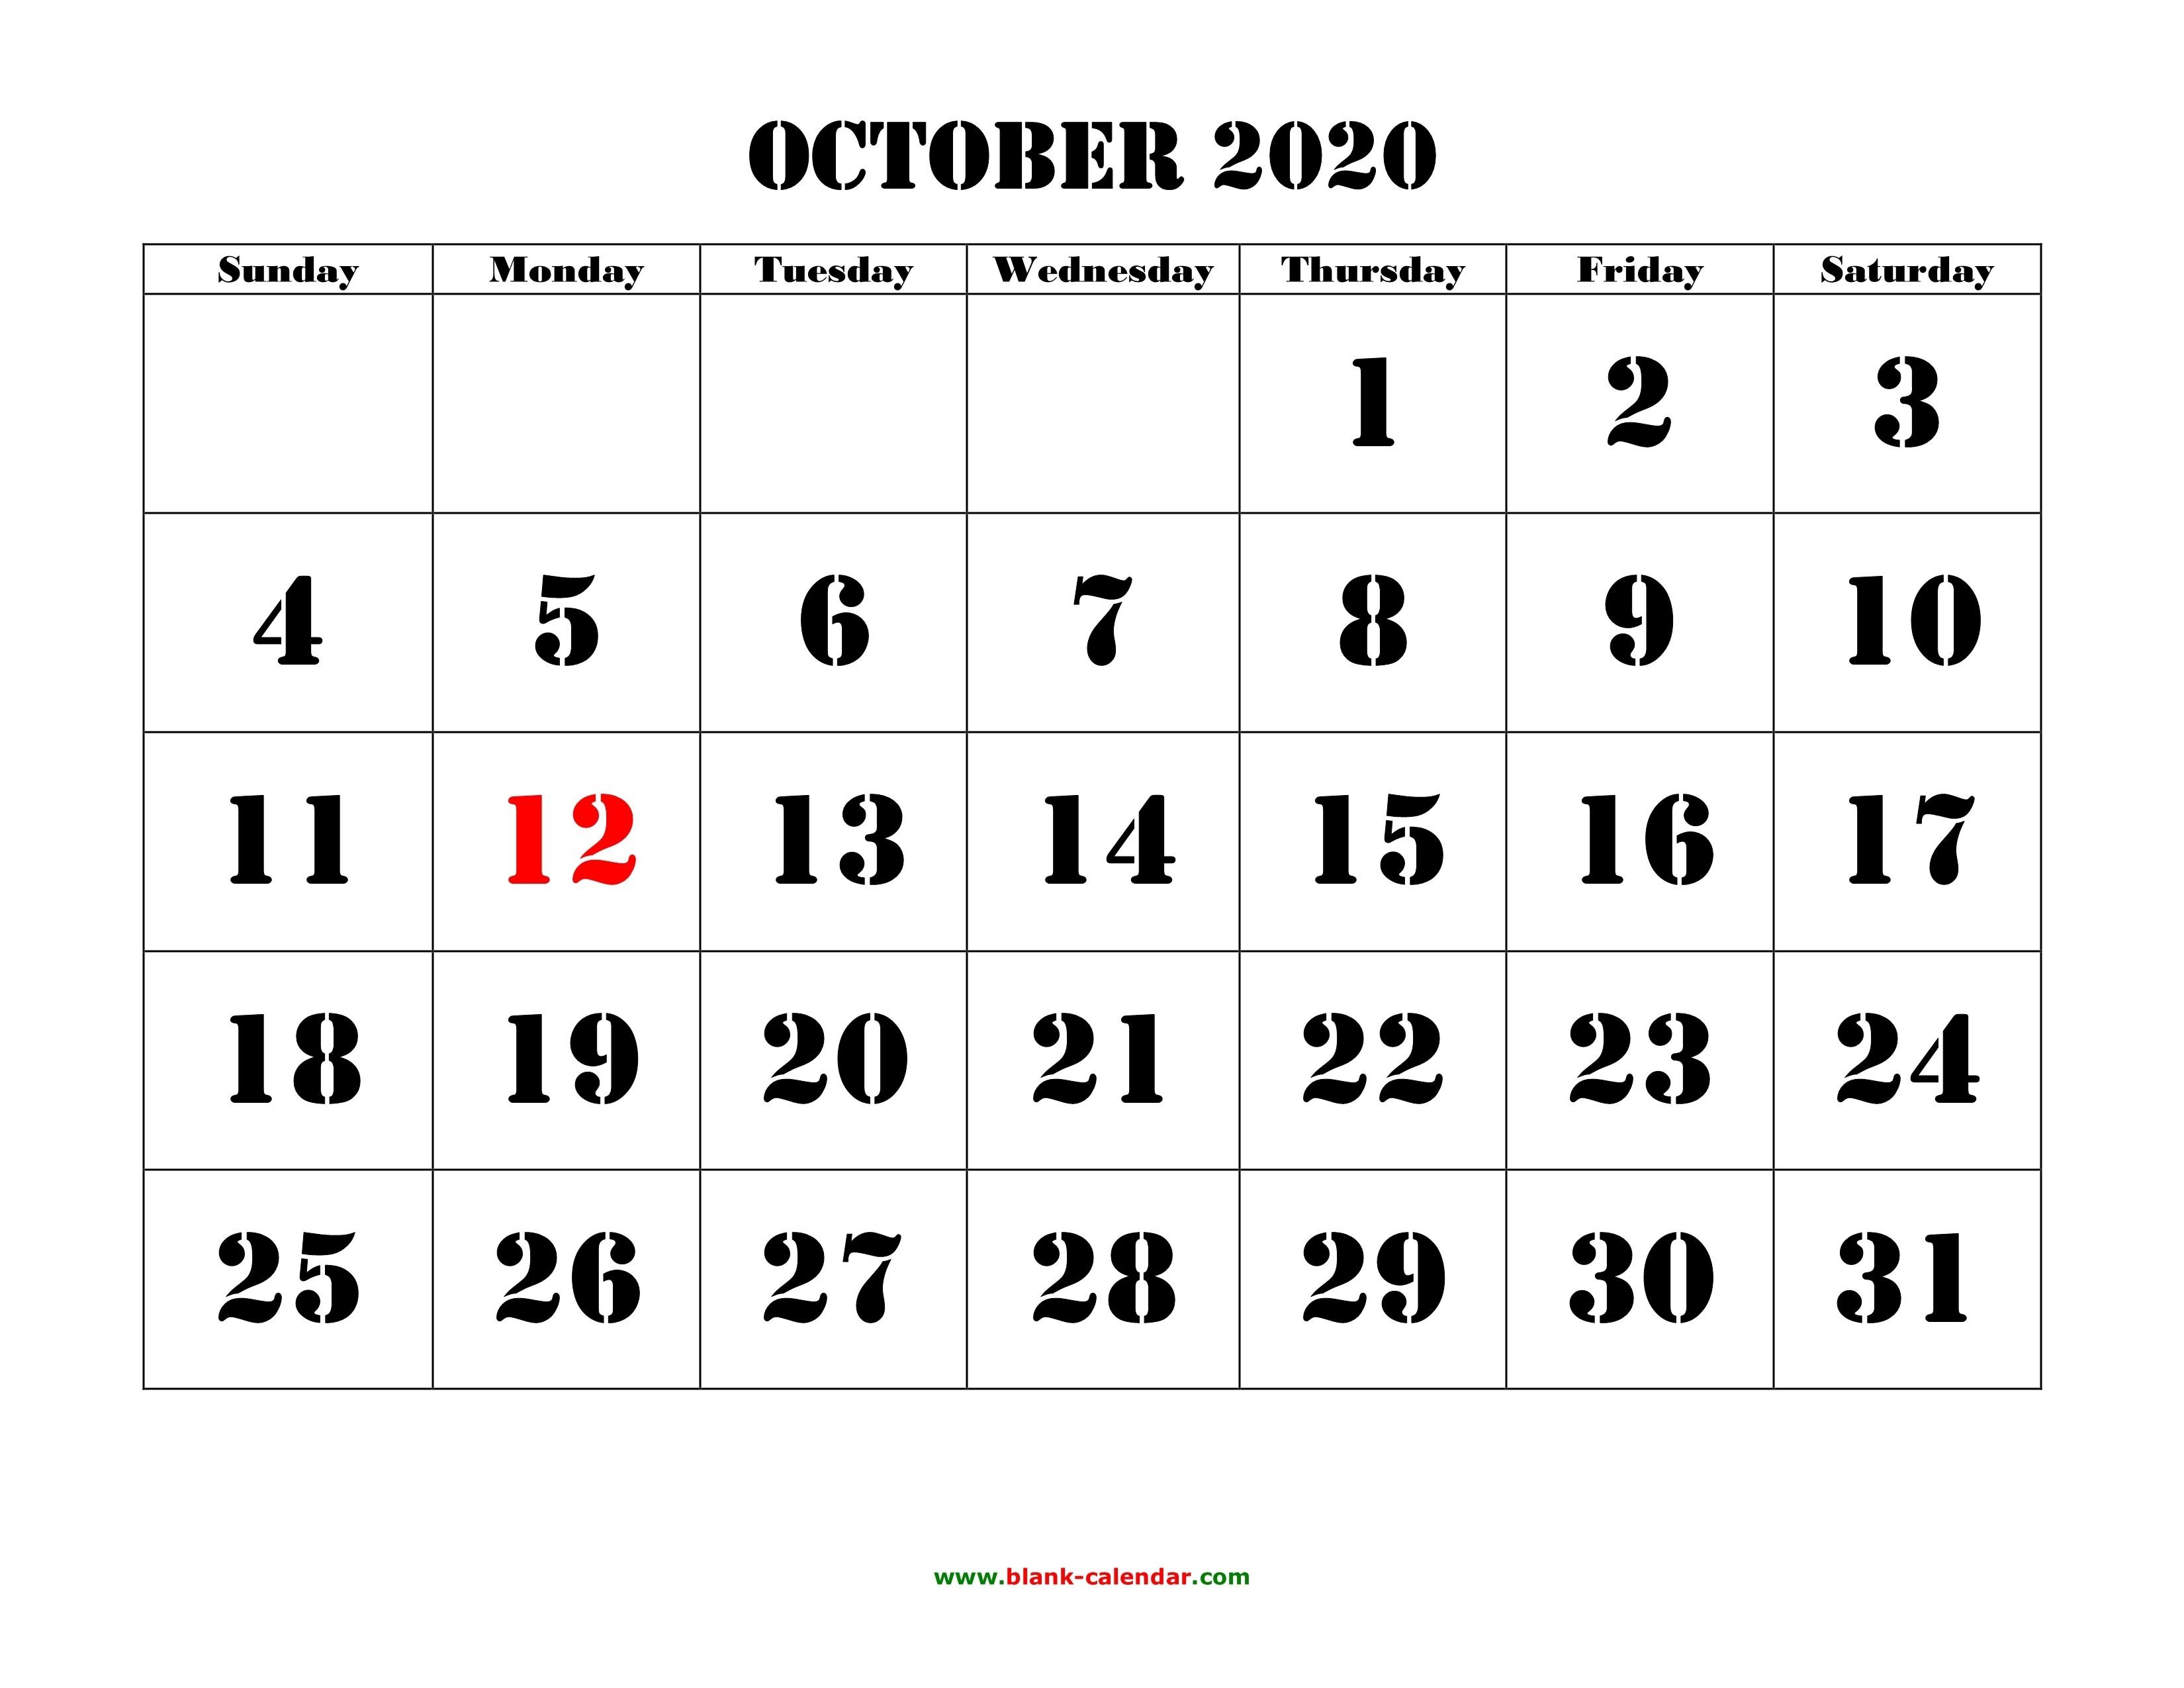 Free Download Printable October 2020 Calendar, Large Font-Blank Calendar October 2020 Printable